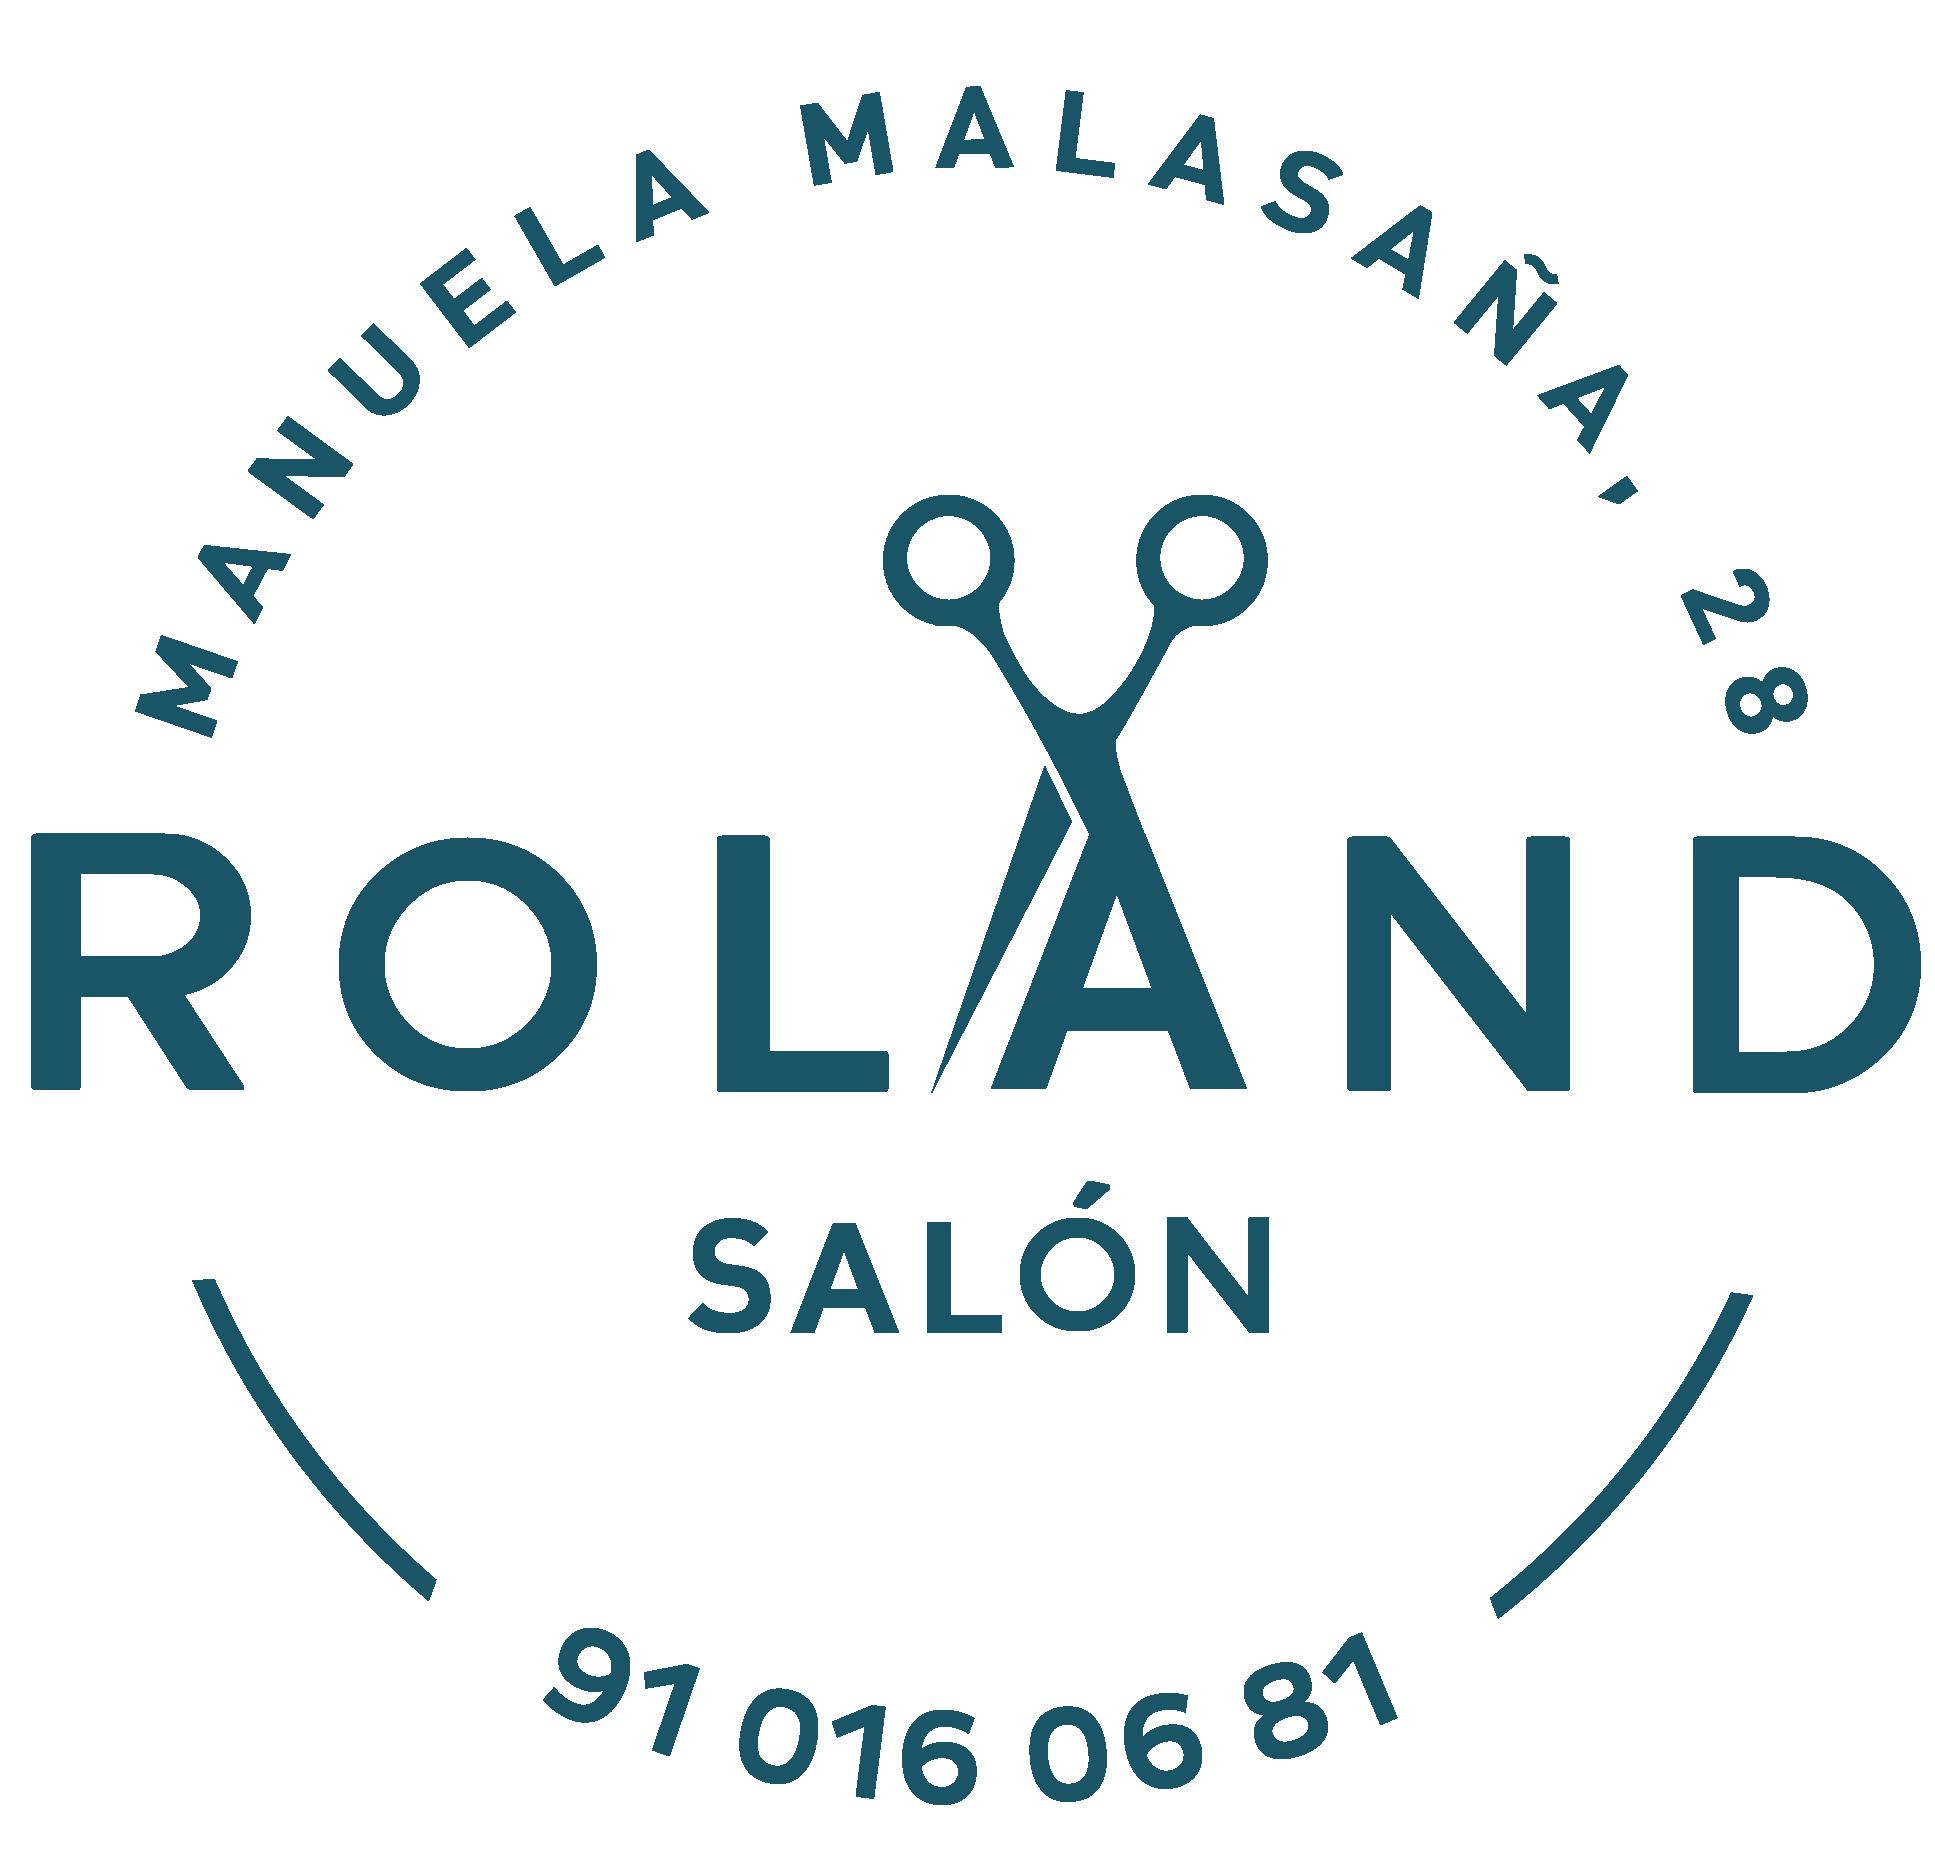 ROLAND SALON